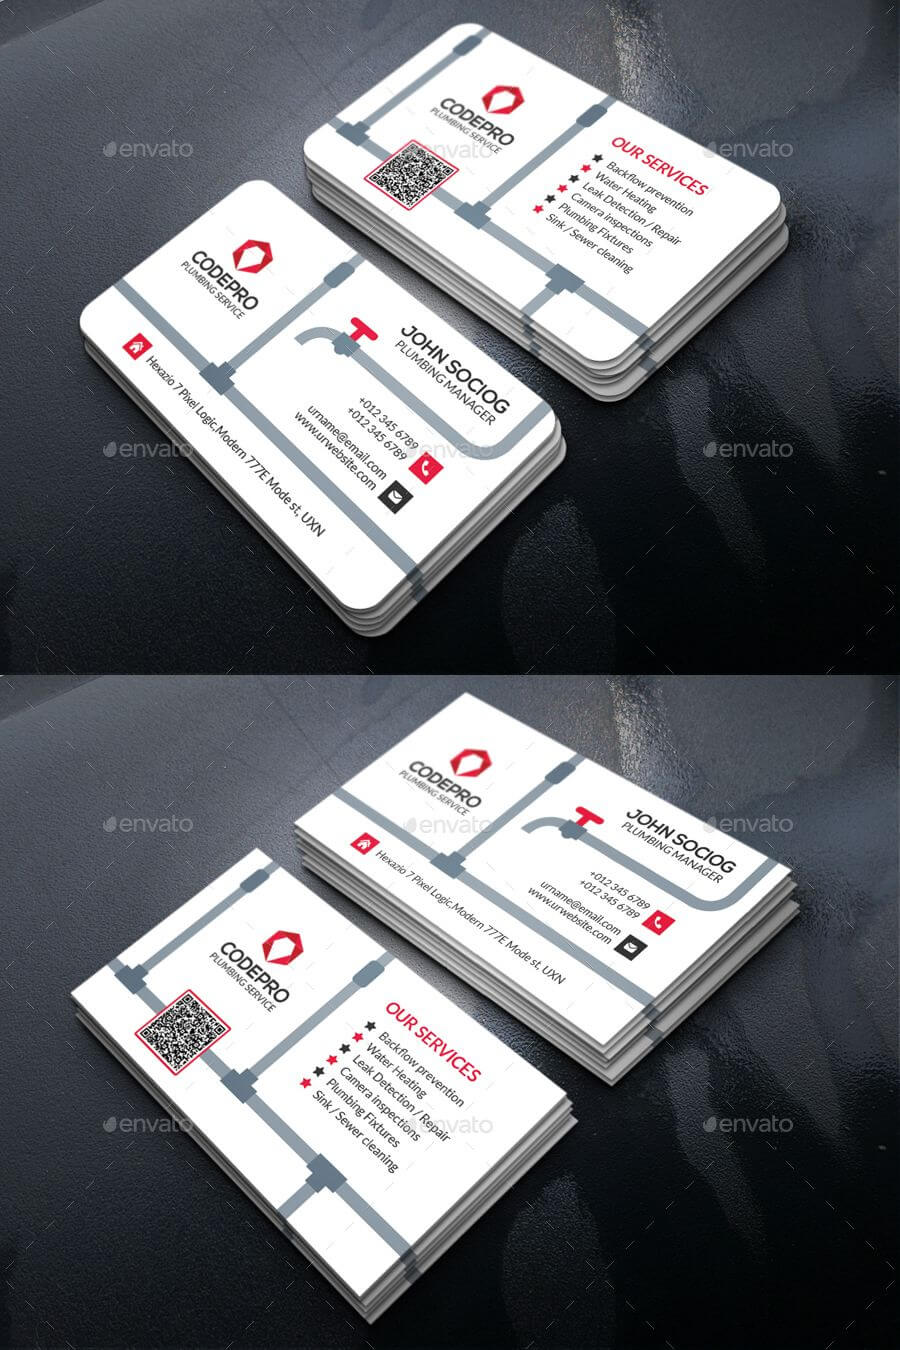 Plumbing Business Card Template Psd | Business Card Design Regarding Business Card Maker Template